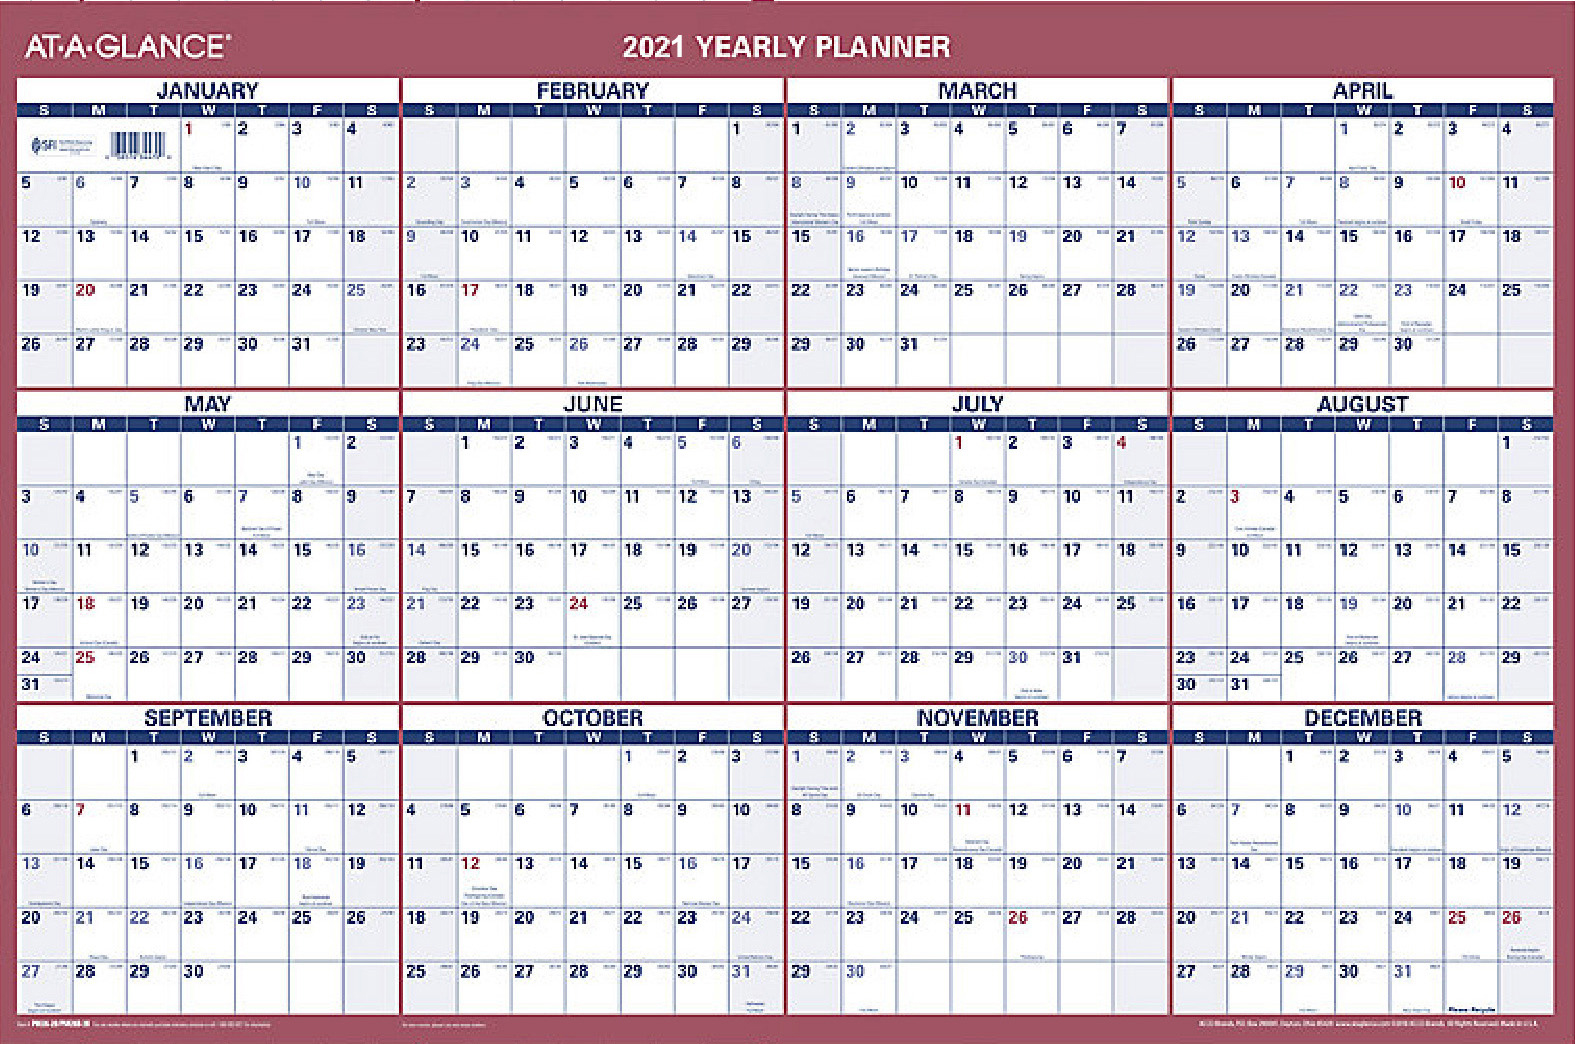 At A Glance 2021 Calendar 2021 Erasable Wall Calendar by AT A GLANCE 48